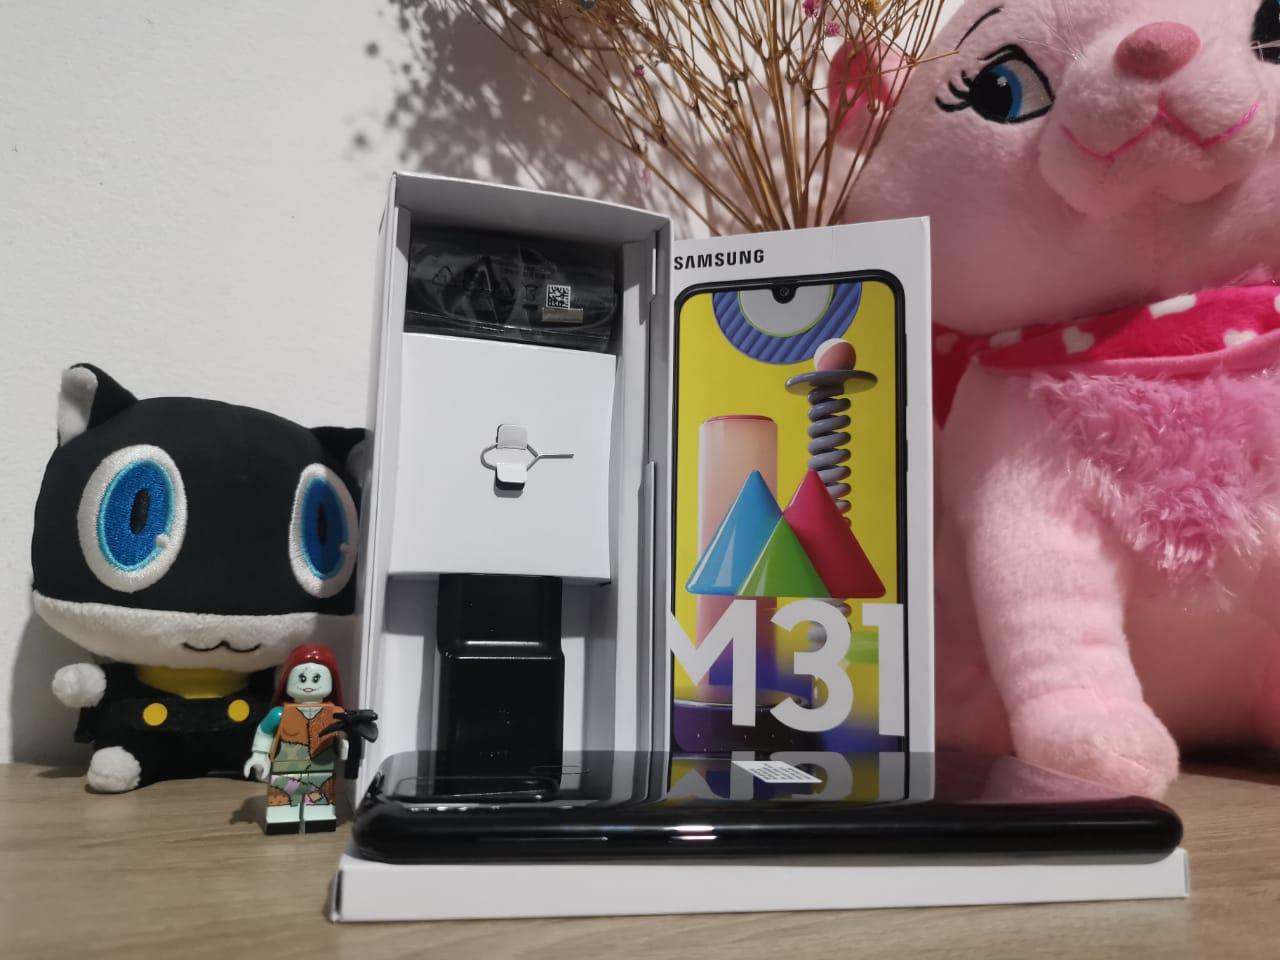 Unboxing Ponsel Baterai 6.000 mAh Samsung Galaxy M31